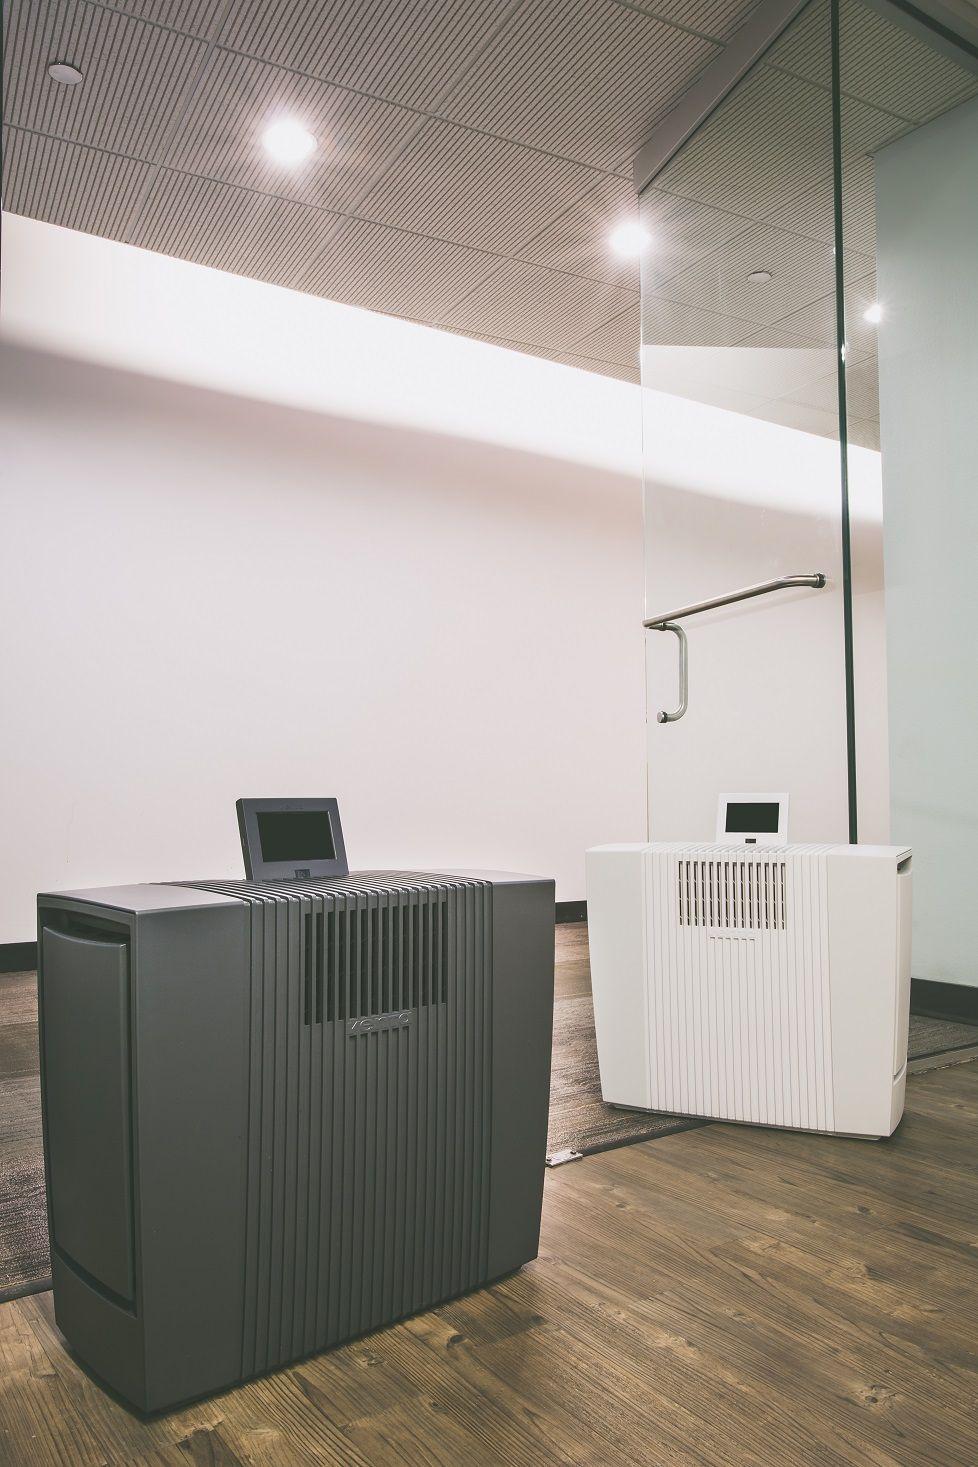 The new 6 Series Venta Airwashers, humidifiers, air